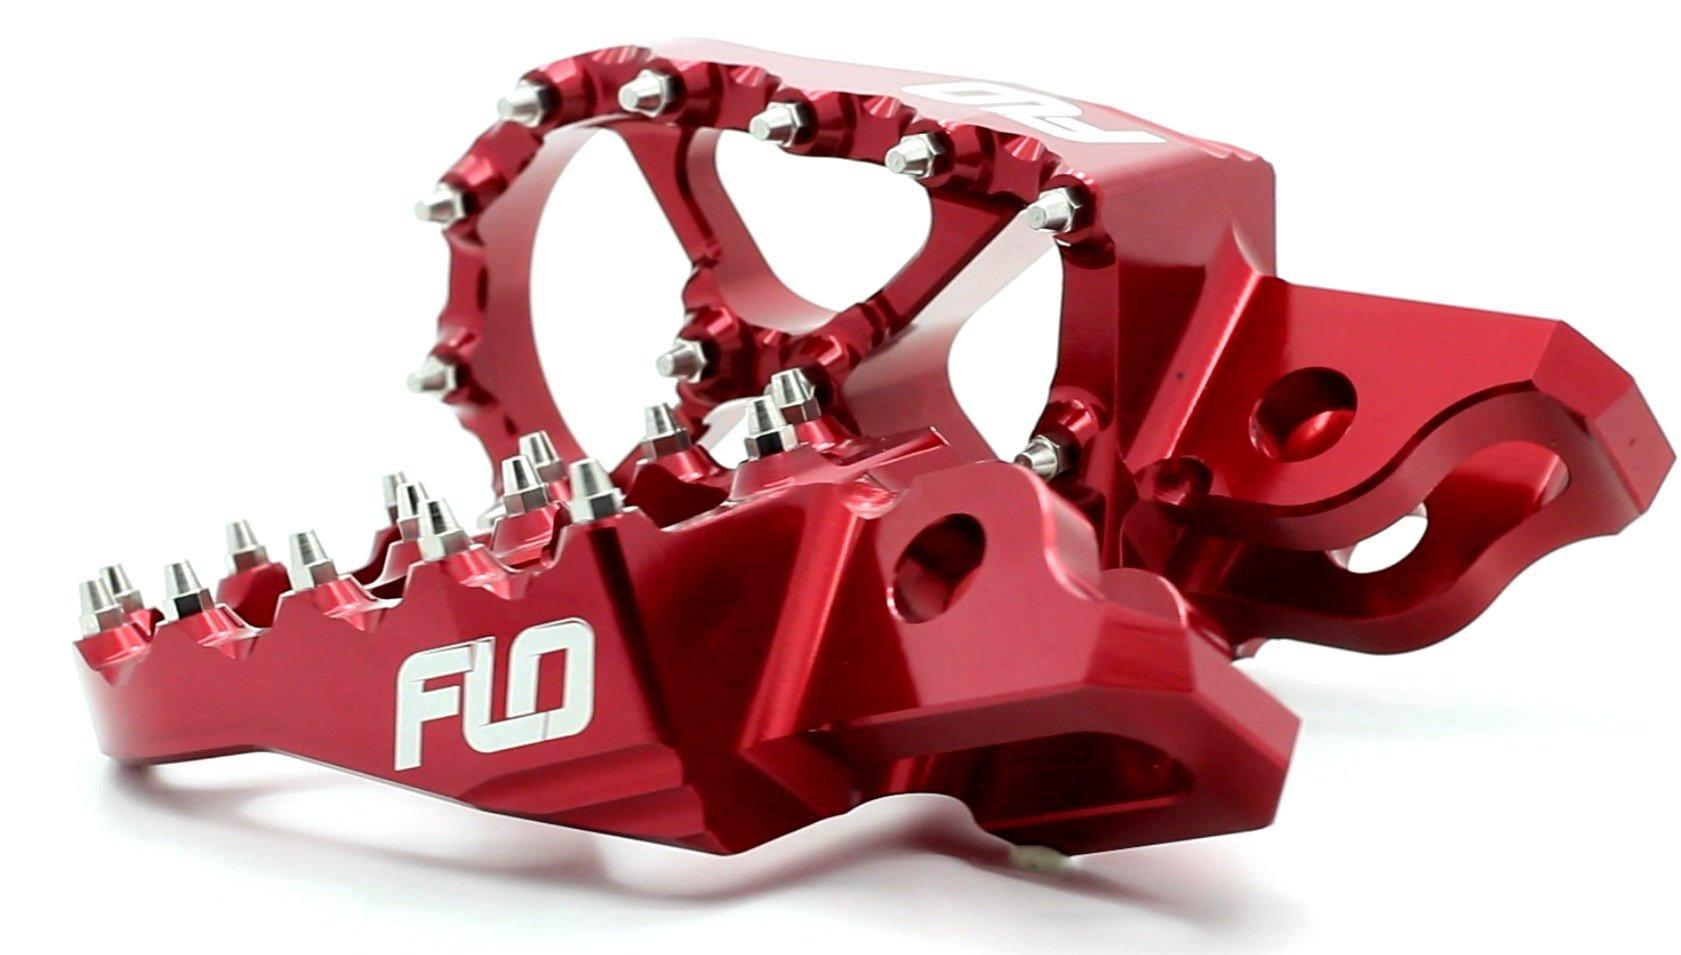 Flo Motorsports Red Honda Crf150r, Cr150/250, Crf250/450r/x 2002-2016 Foot Pegs Fpeg-791r